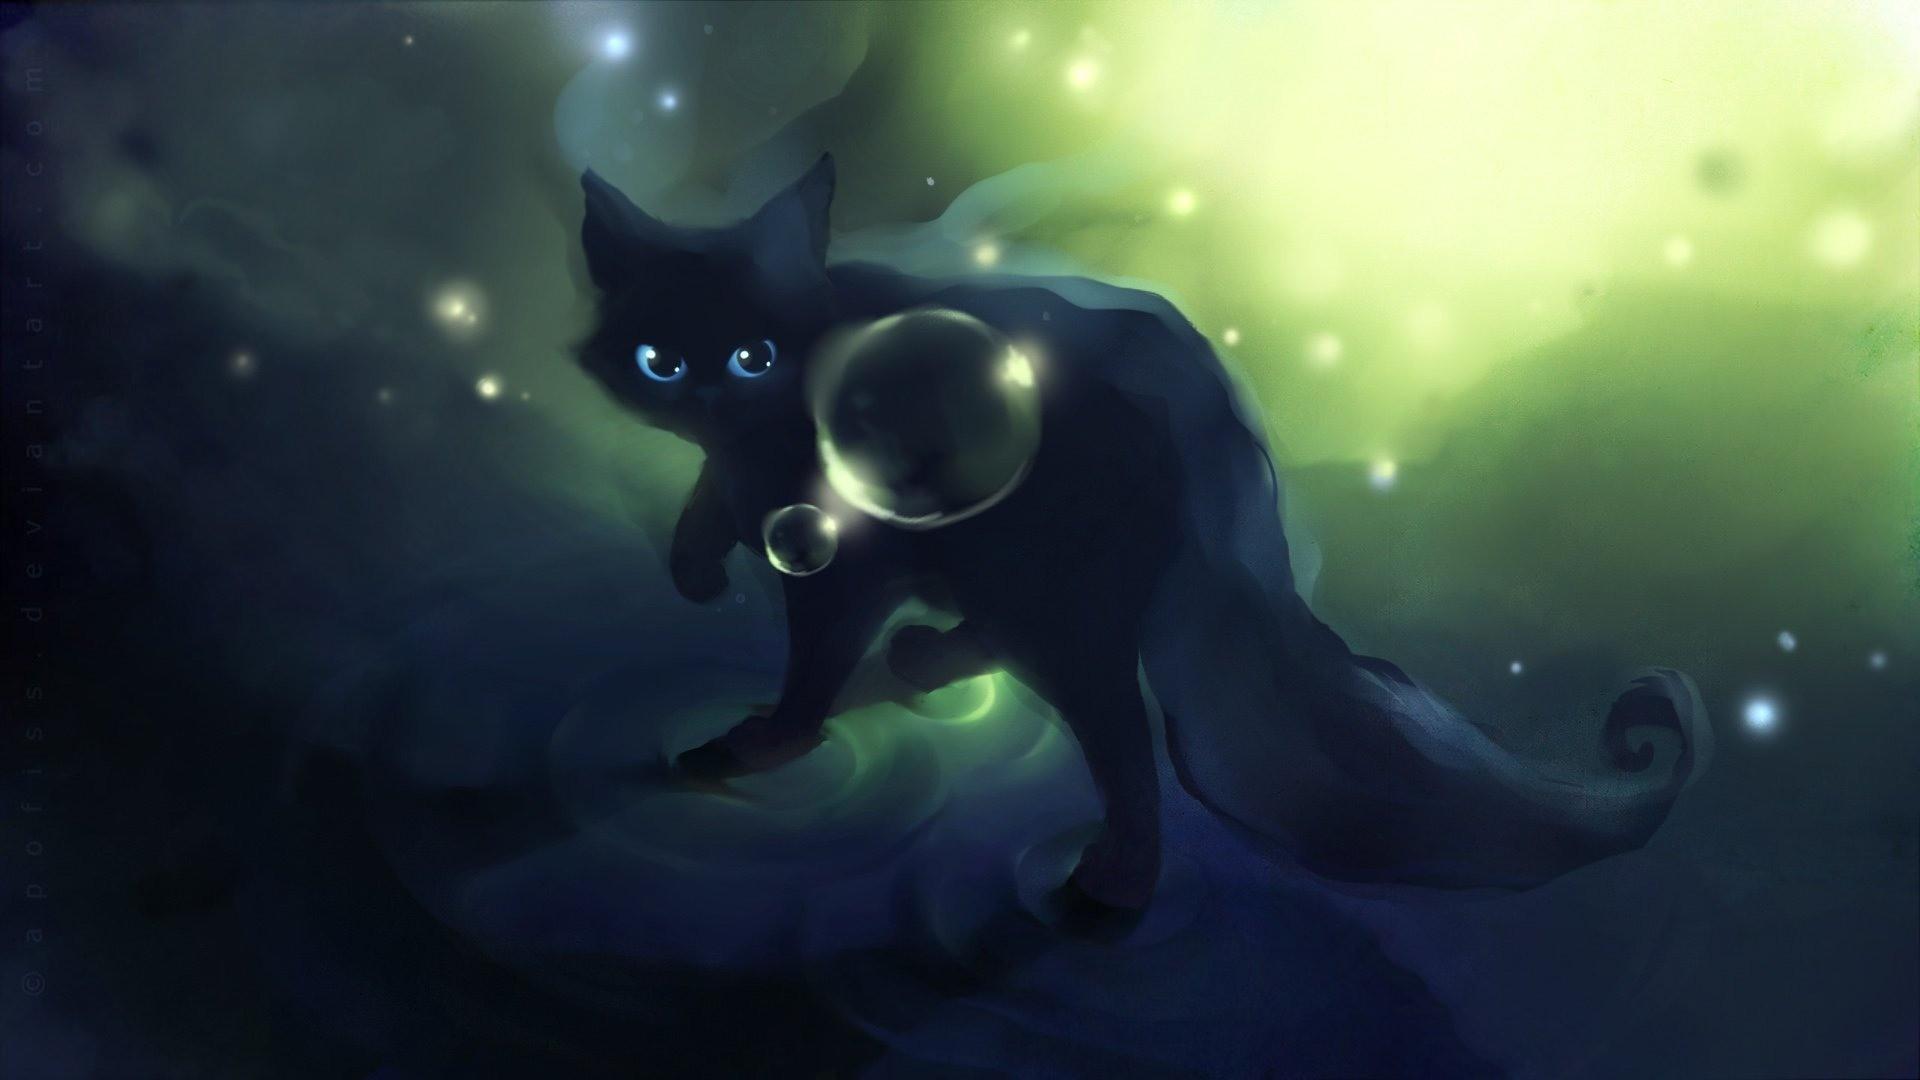 Apofiss small black cat wallpaper watercolor illustrations #12 – 1920×1080